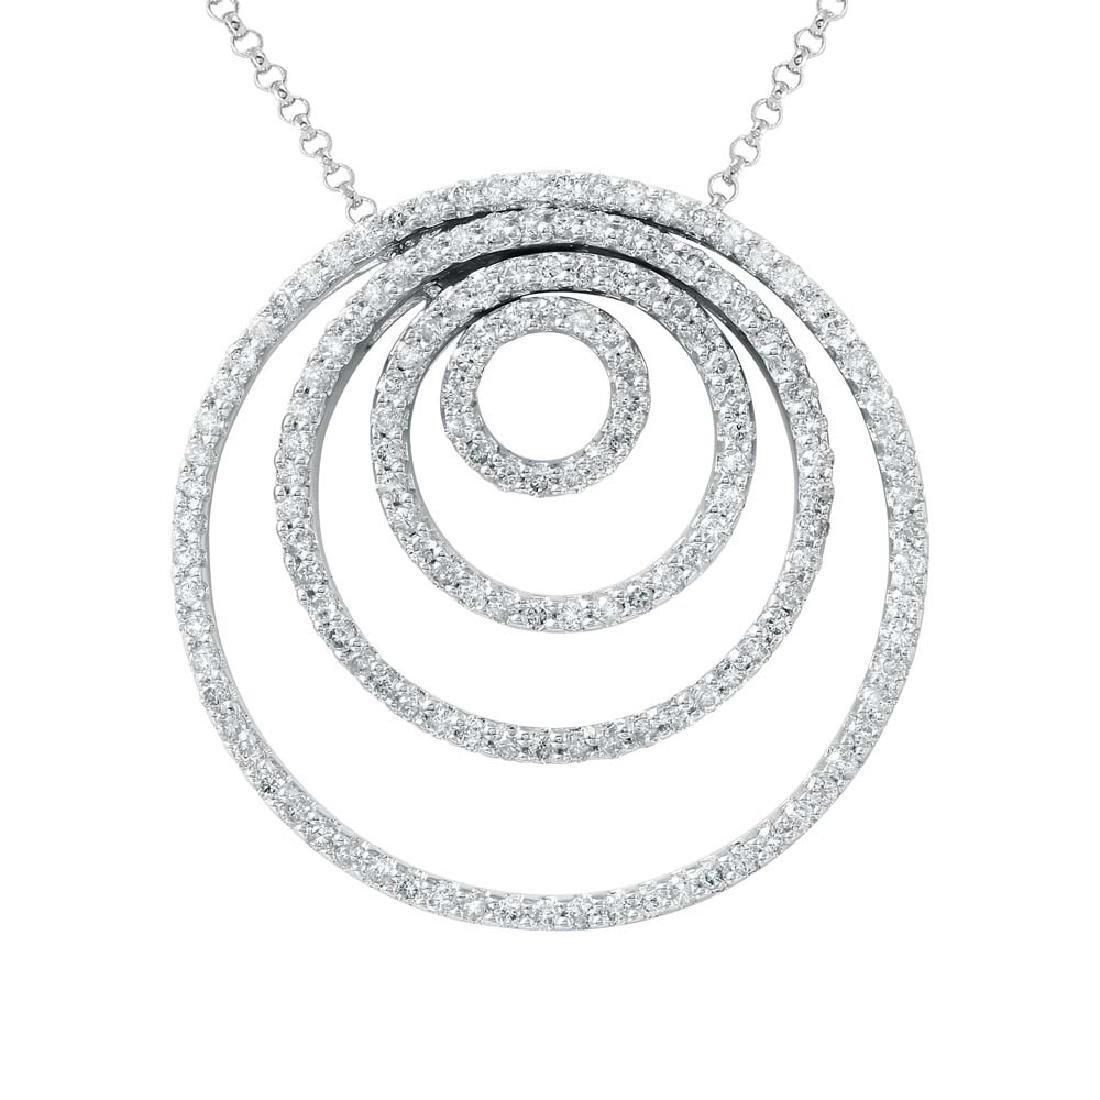 2.08 CTW Diamond Slider Necklace in 14K White Gold